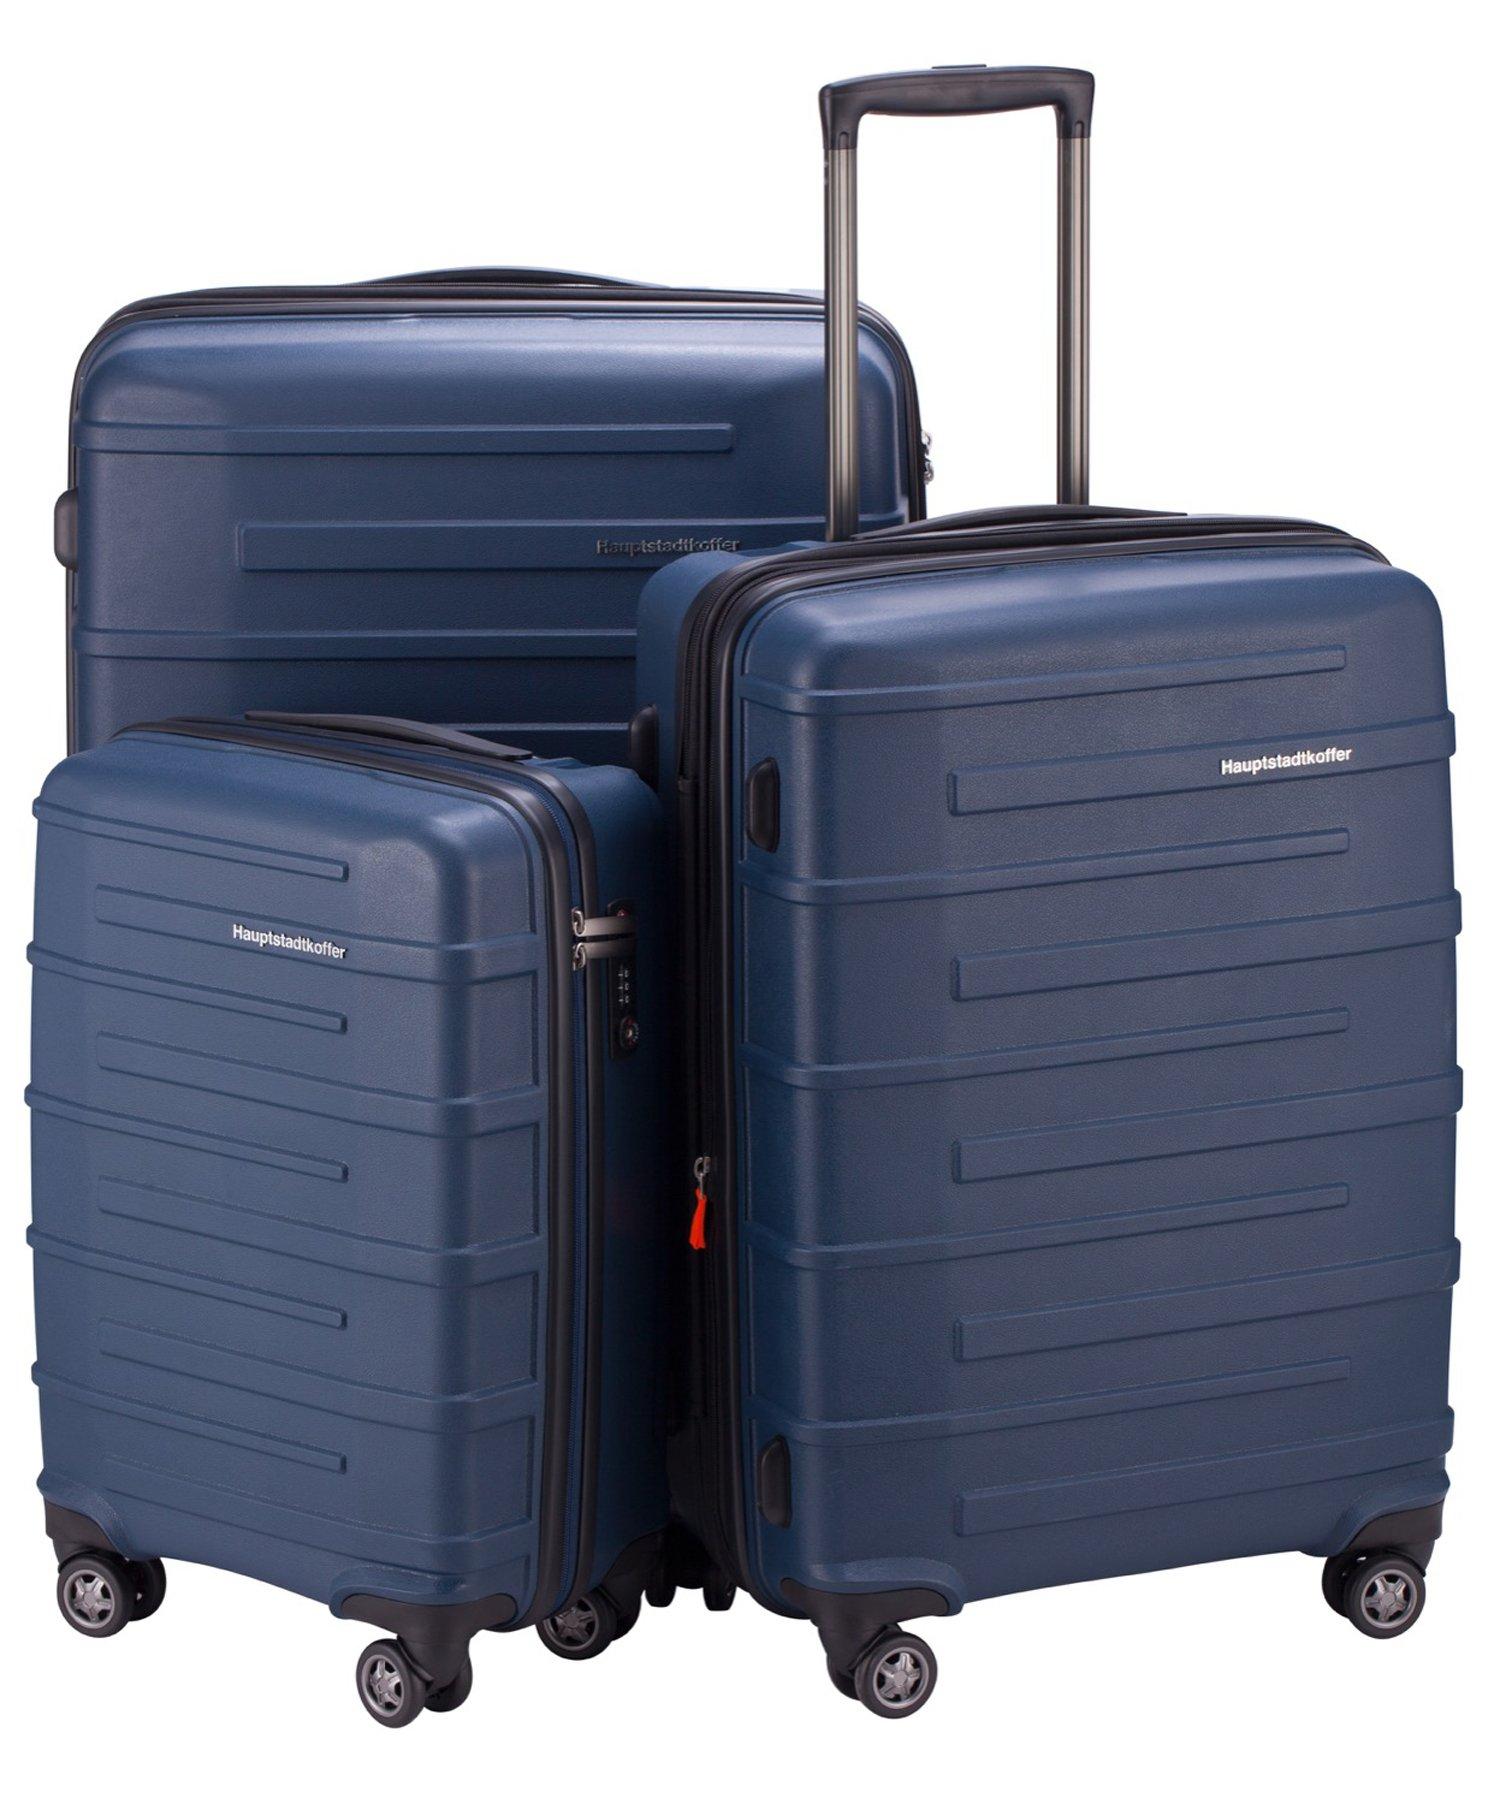 "HAUPTSTADTKOFFER Ostkreuz Luggages Set Matt Suitcase Set Hardside Spinner Trolley Expandable (20"", 24"" & 28"") TSA Blue"